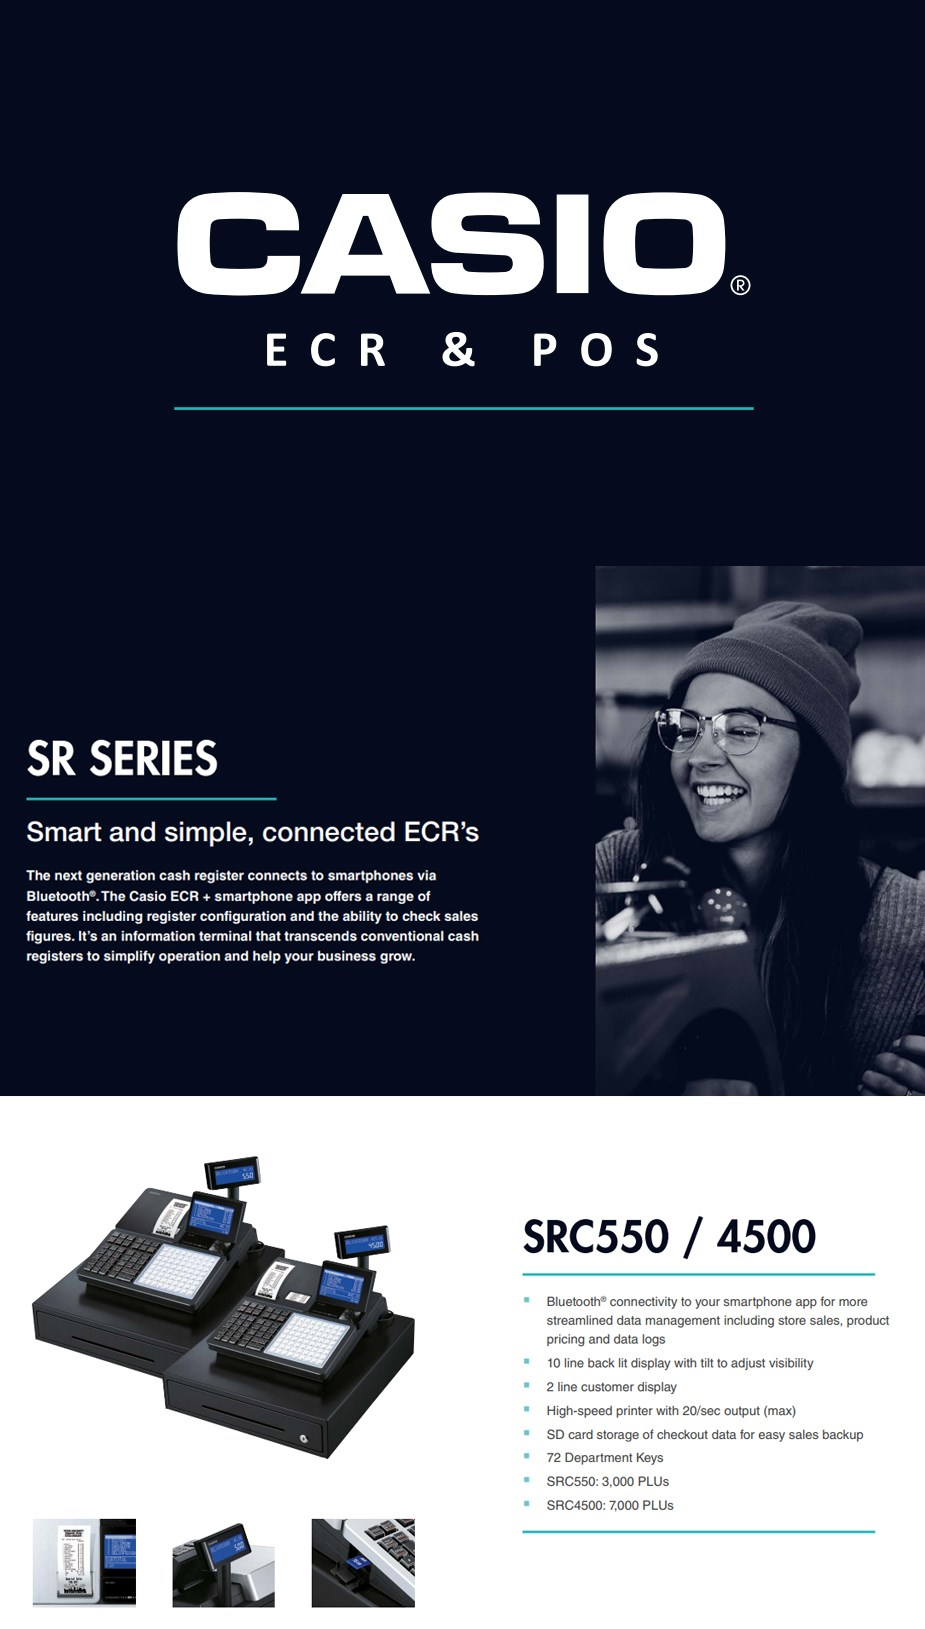 Casio SRC550 Electronic Cash Register with Bluetooth - Desktop Overview 1